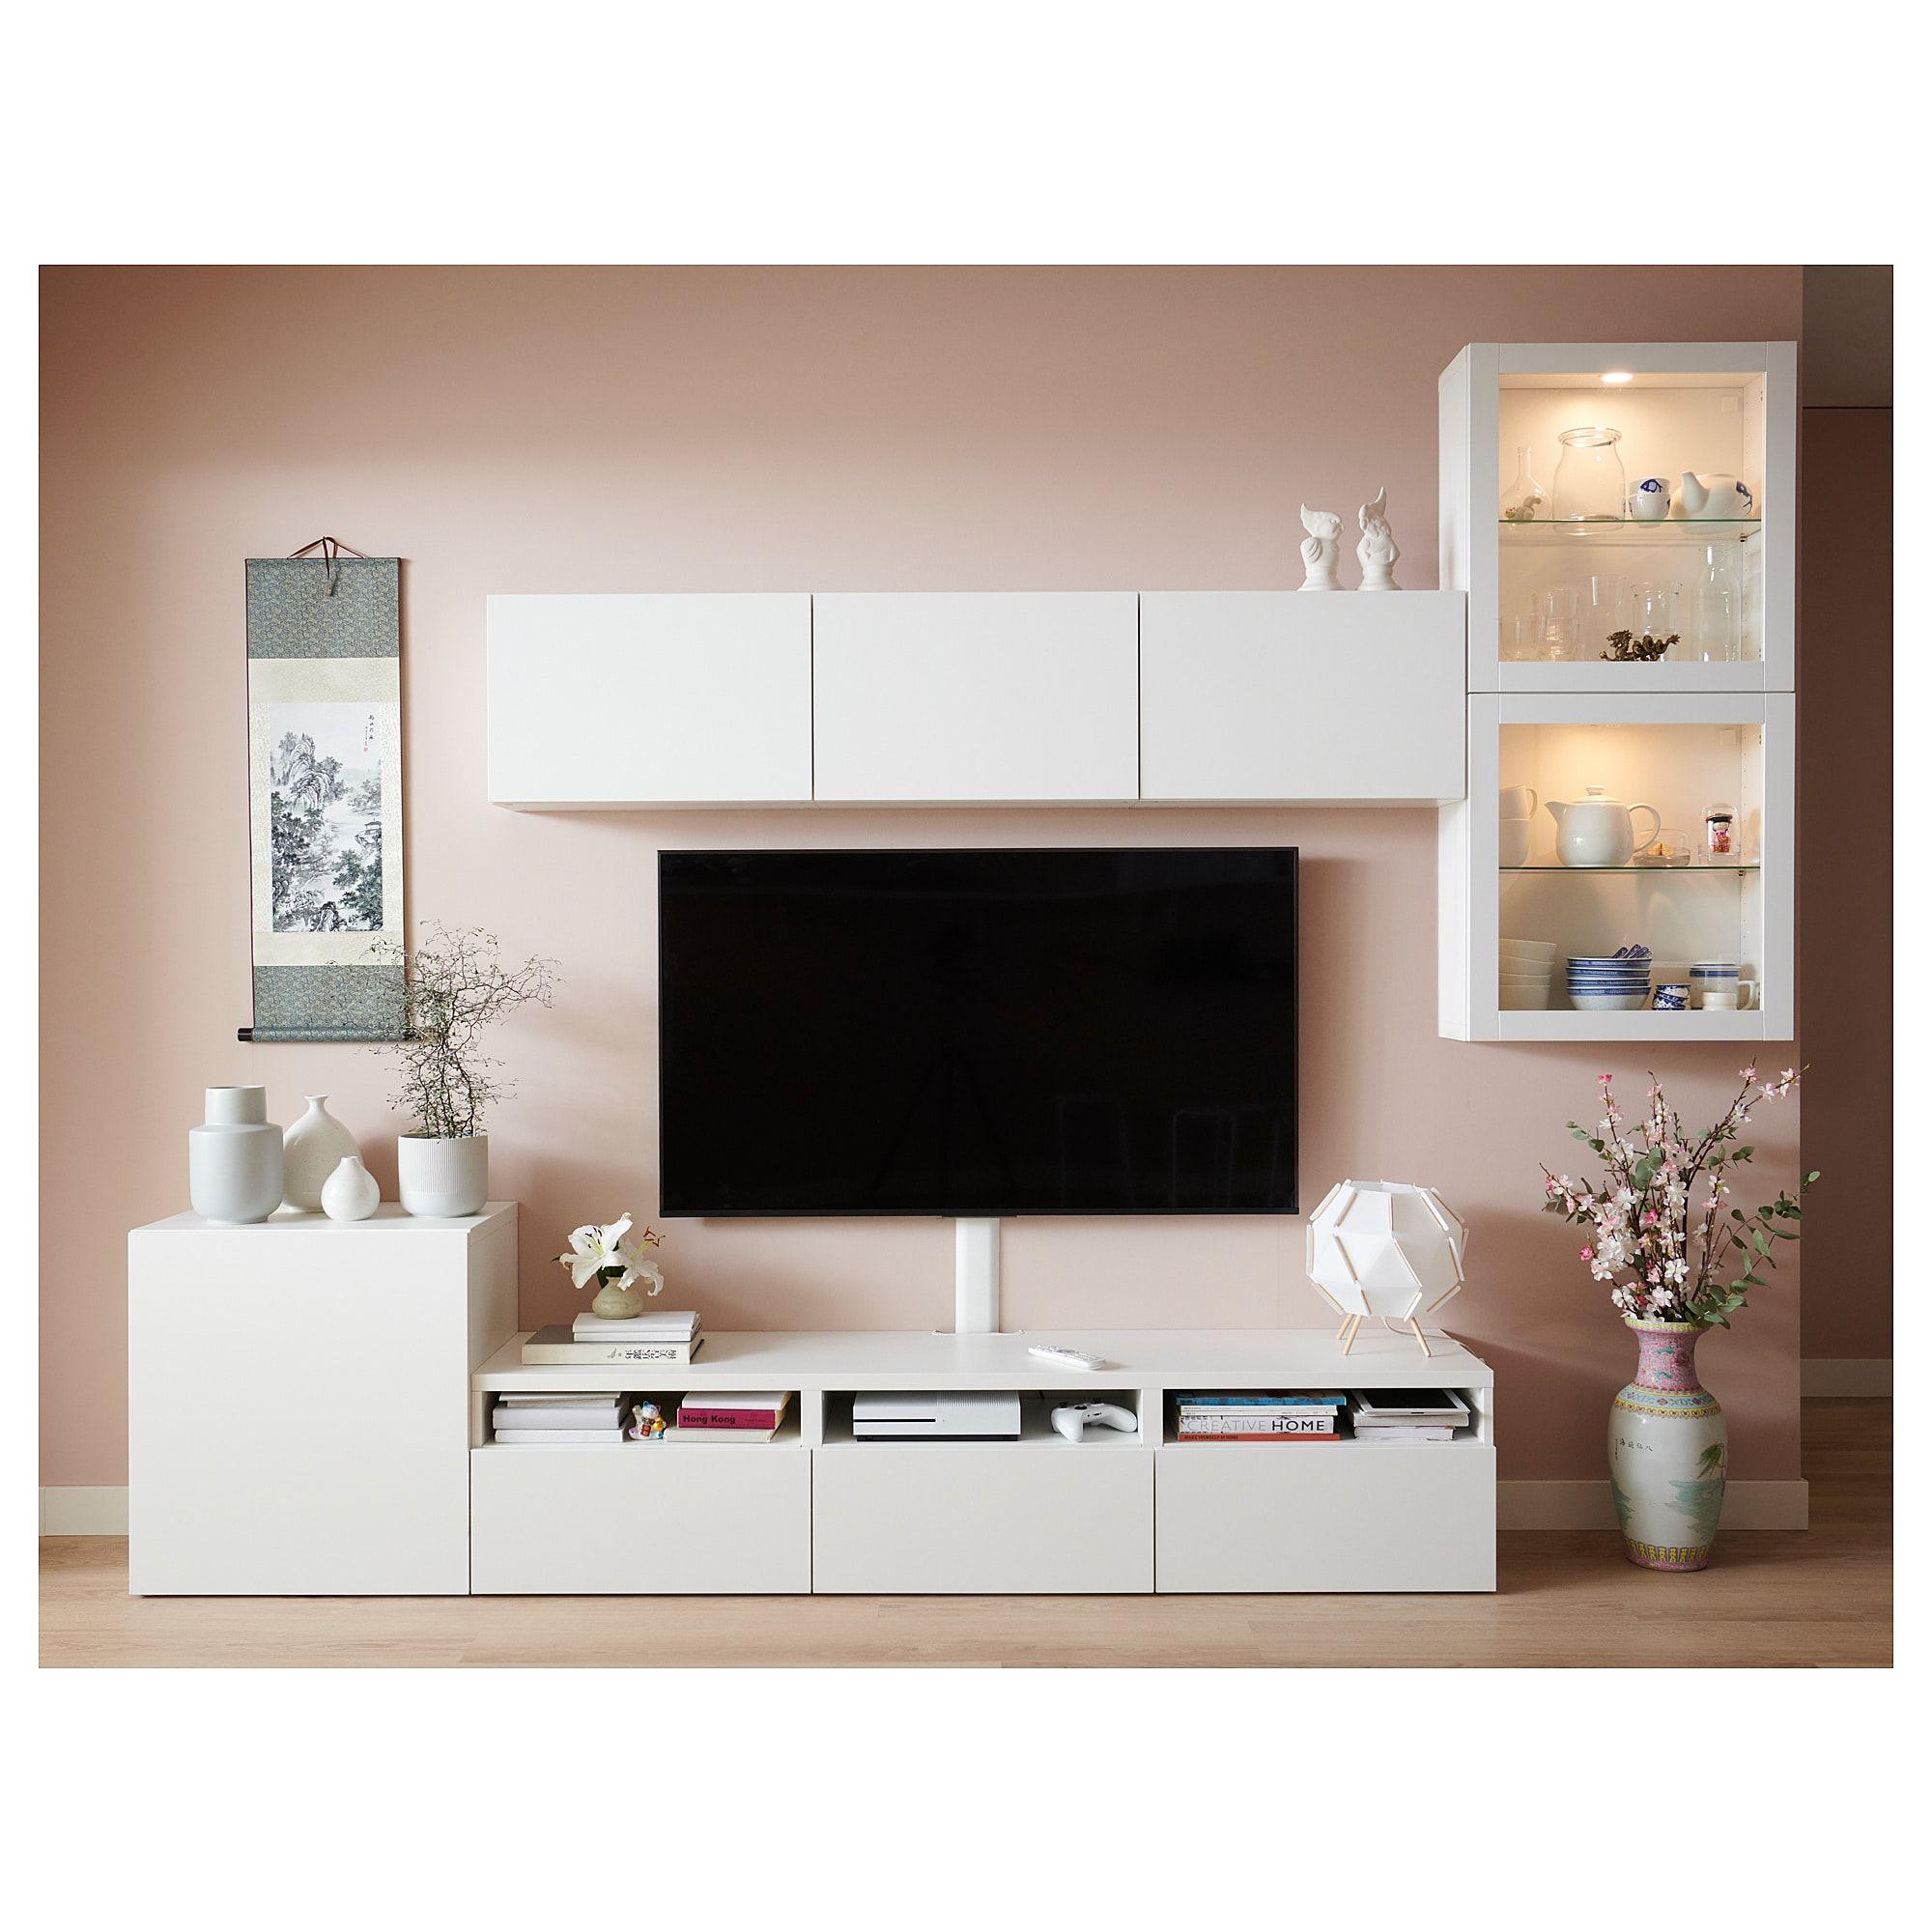 Photo of BESTÅ TV comb. with glass doors – Lappviken, Sindvik clear glass white – IKEA Austria